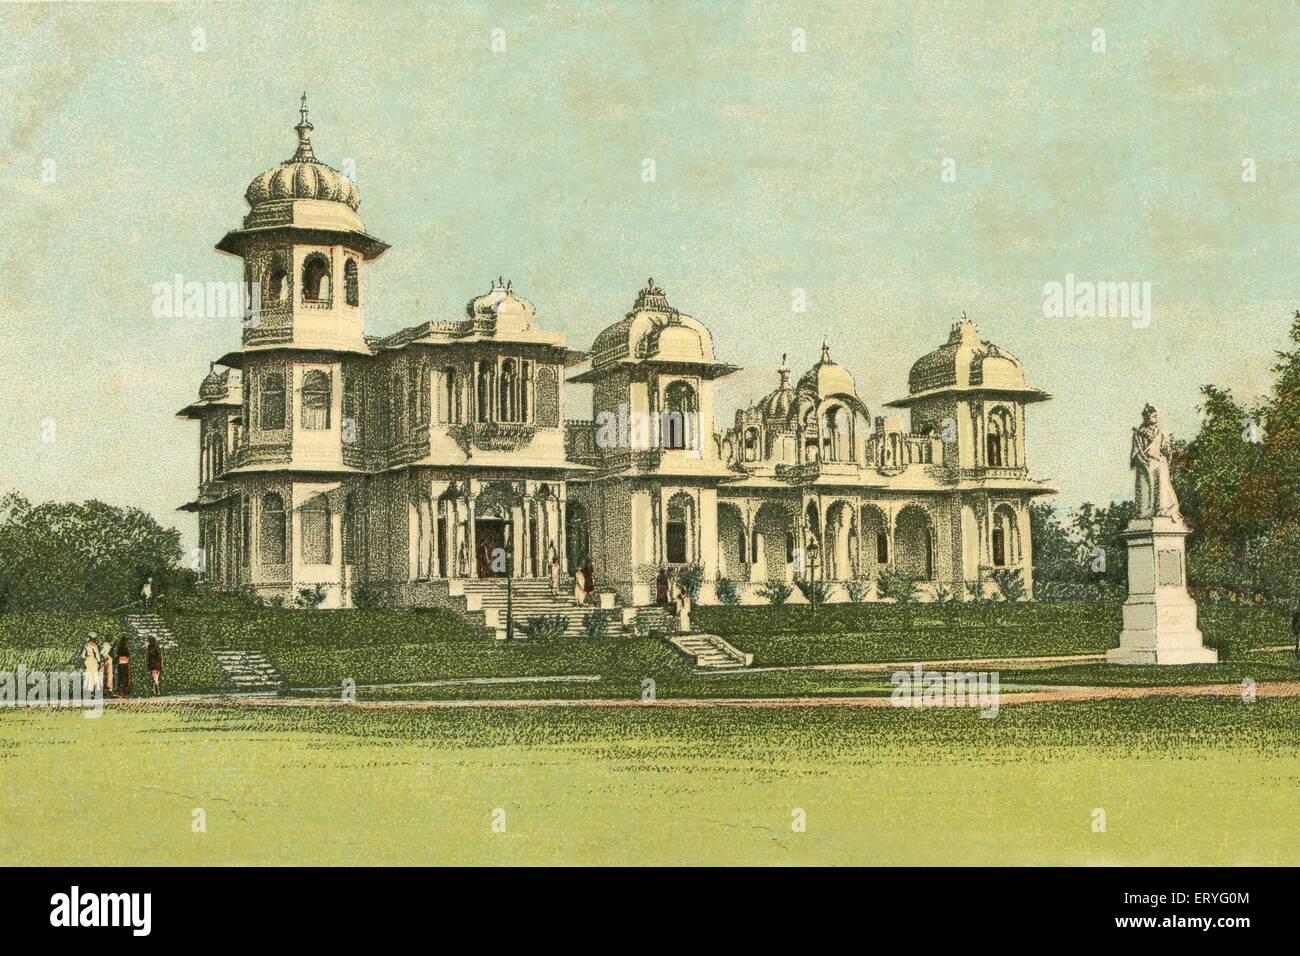 aad 170558 - Old vintage 1900s Victoria Museum now Saraswati Bhawan in Gulab Bagh , Udaipur , Rajasthan , India - Stock Image